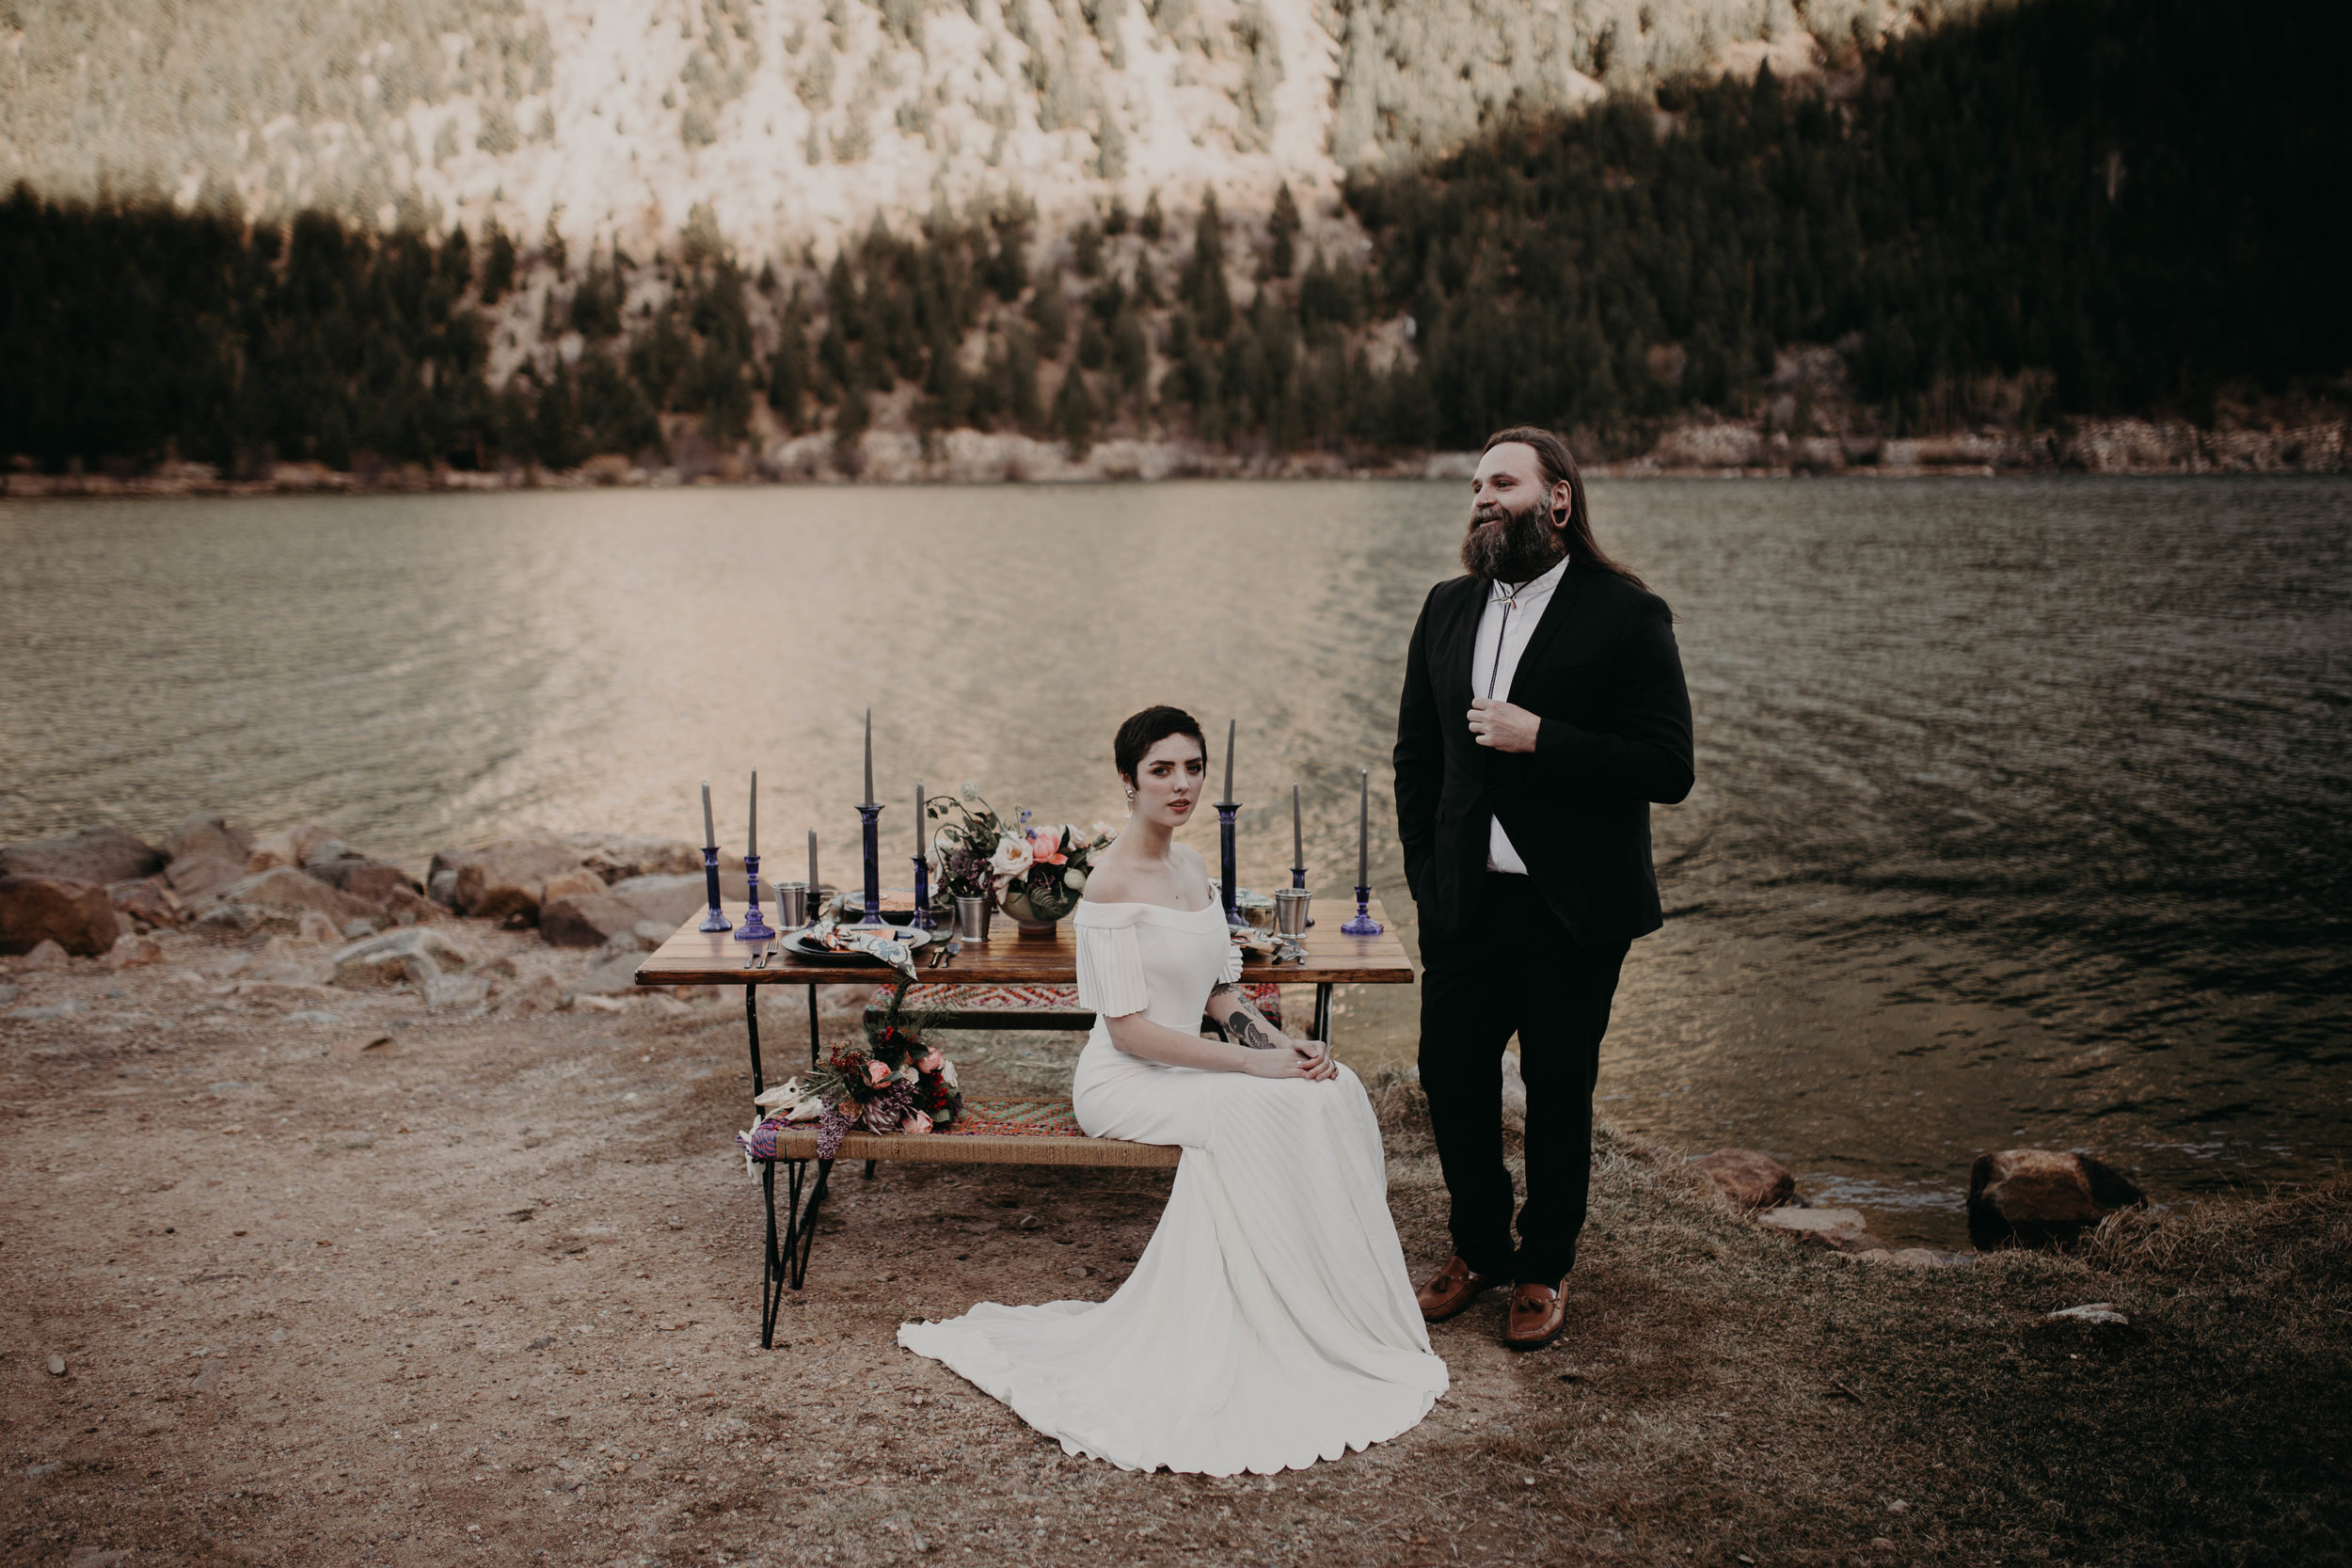 COLORADO-ELOPEMENT-WEDDING-INSPIRATION429.JPG